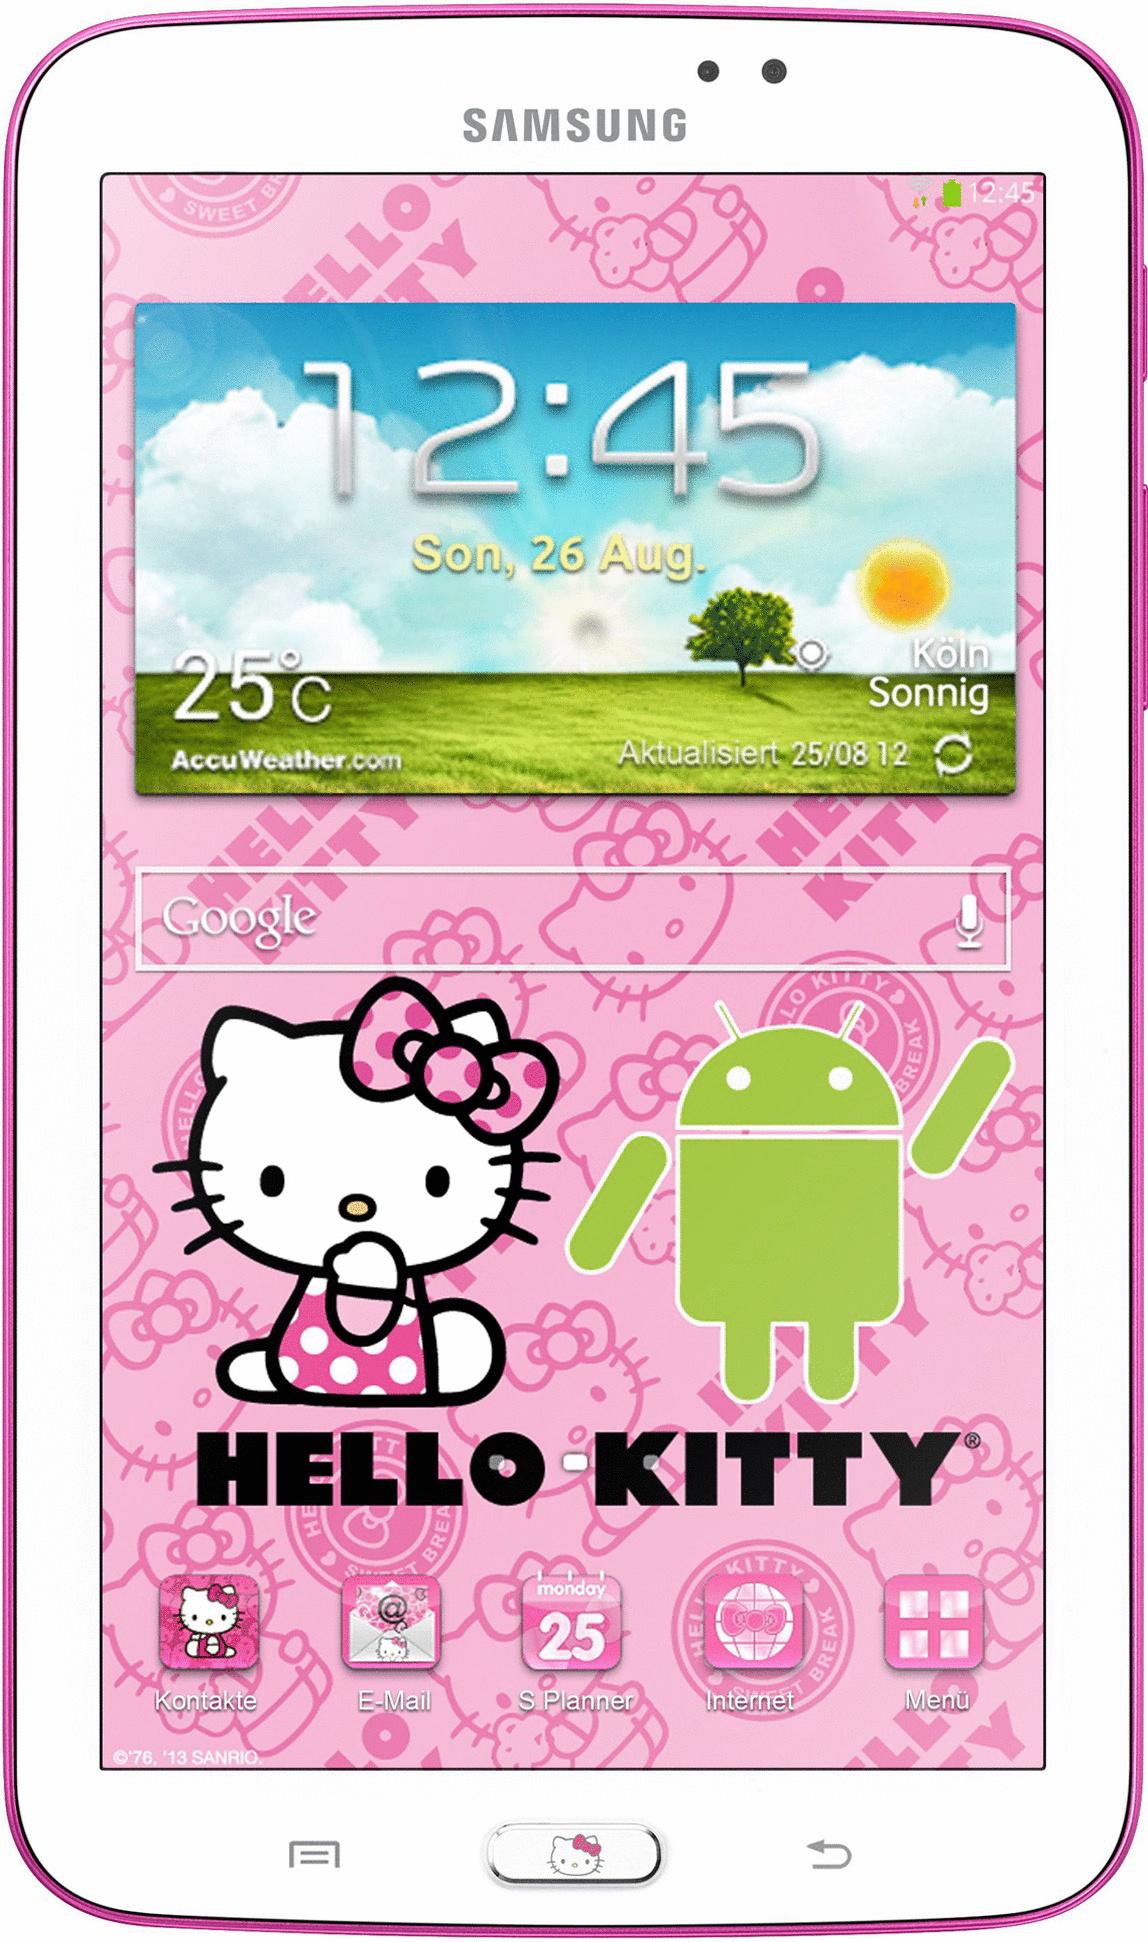 Samsung Galaxy Tab 3 7.0 7 8GB [wifi, Hello Kitty Edition] wit